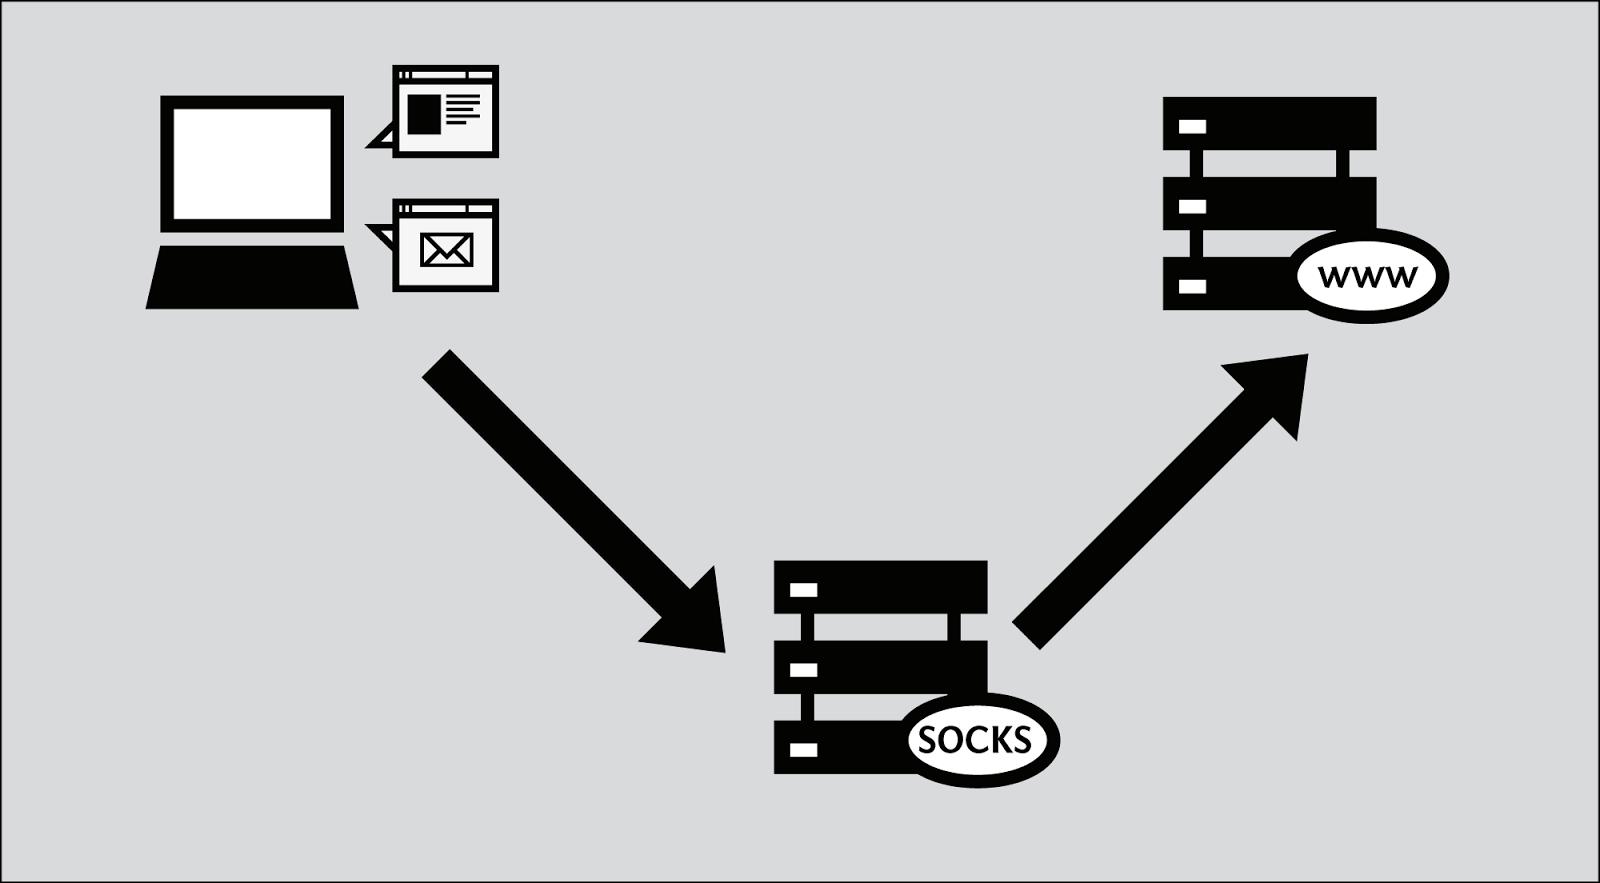 Daily Fresh Socks 5 Proxy Vip Lists - Freeware